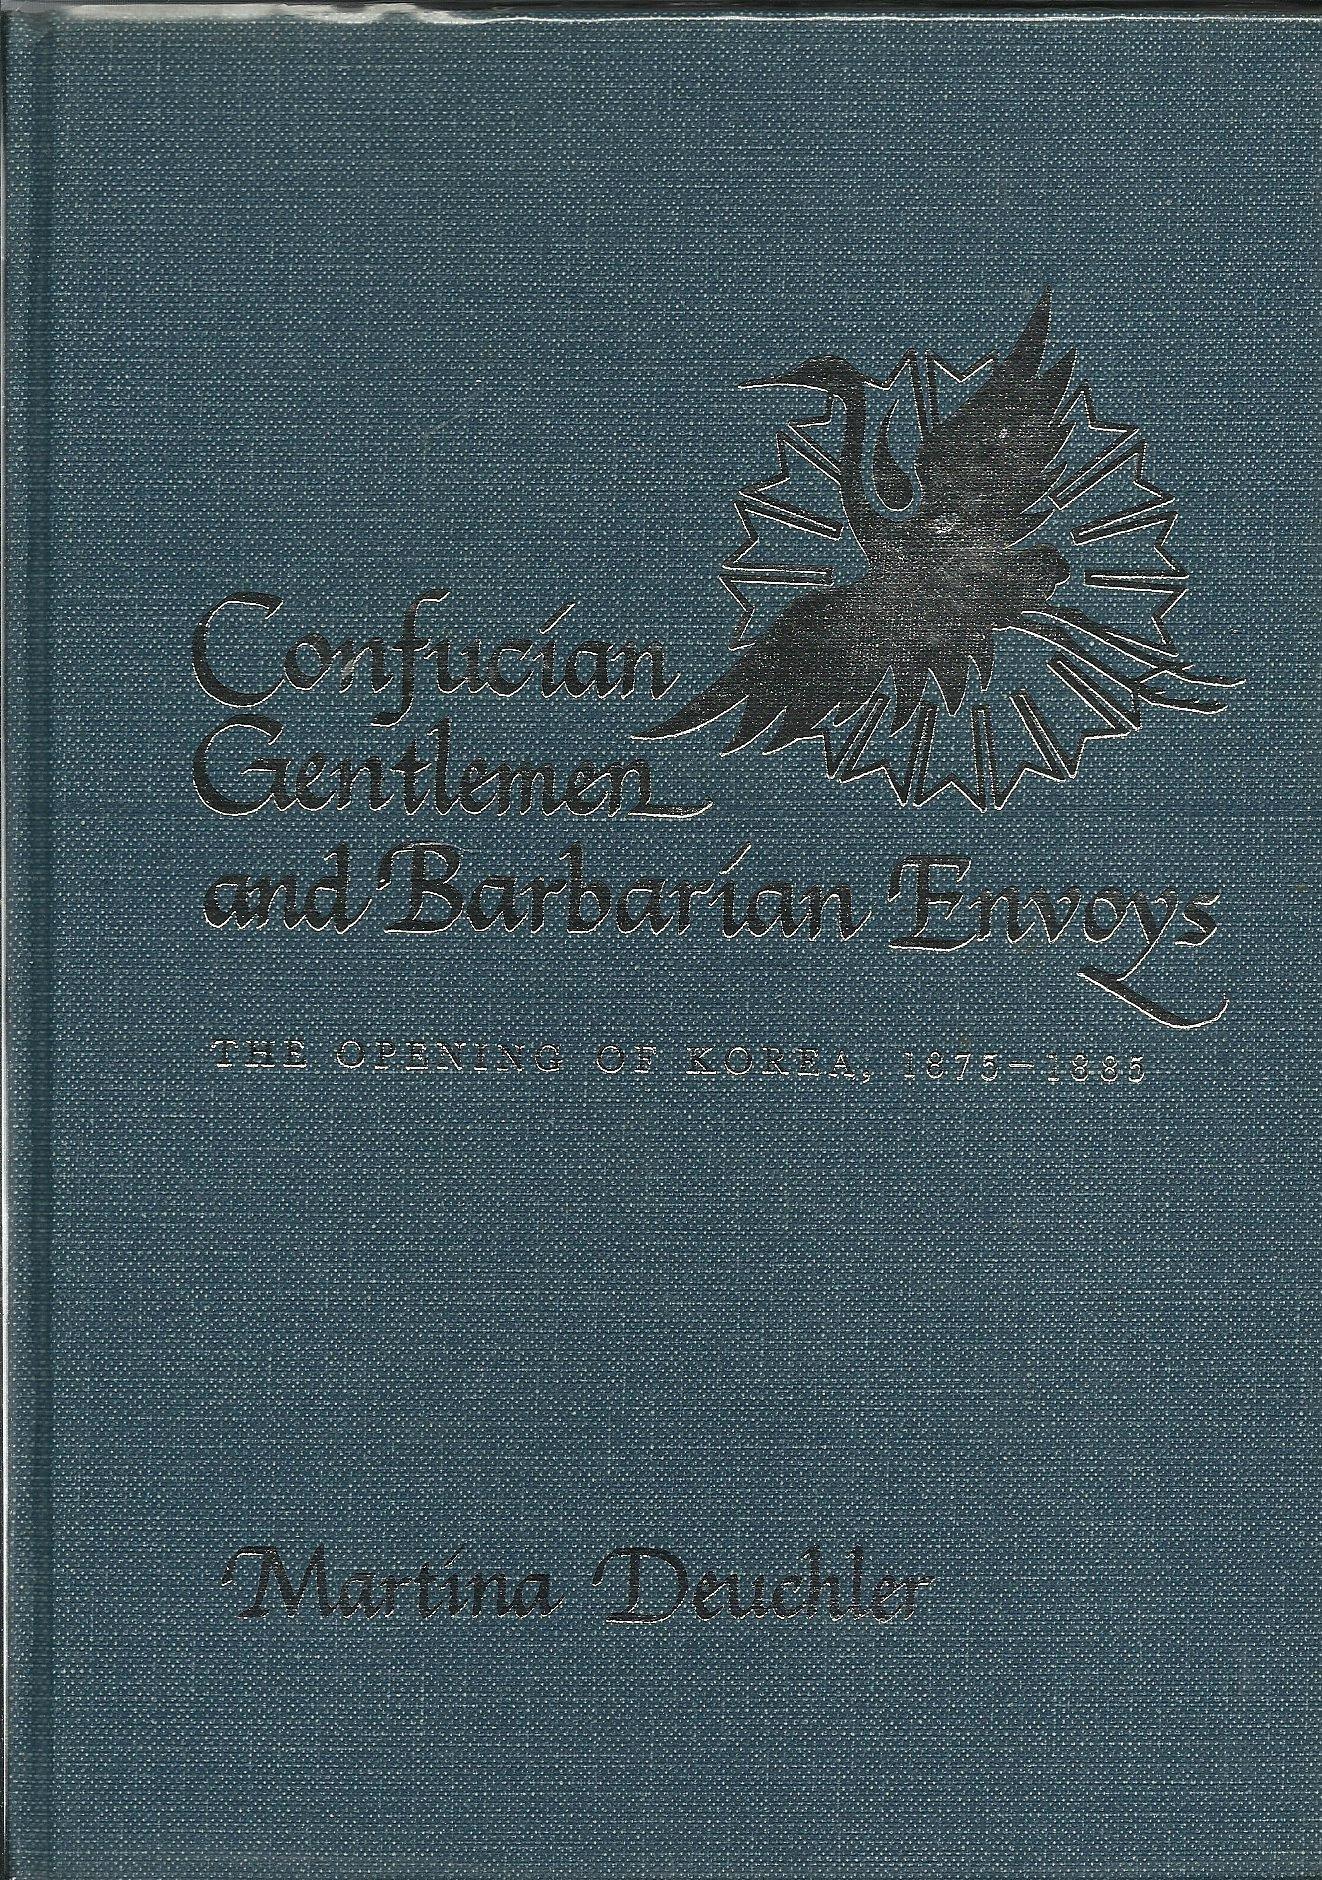 Confucian Gentlemen and Barbarian Envoys